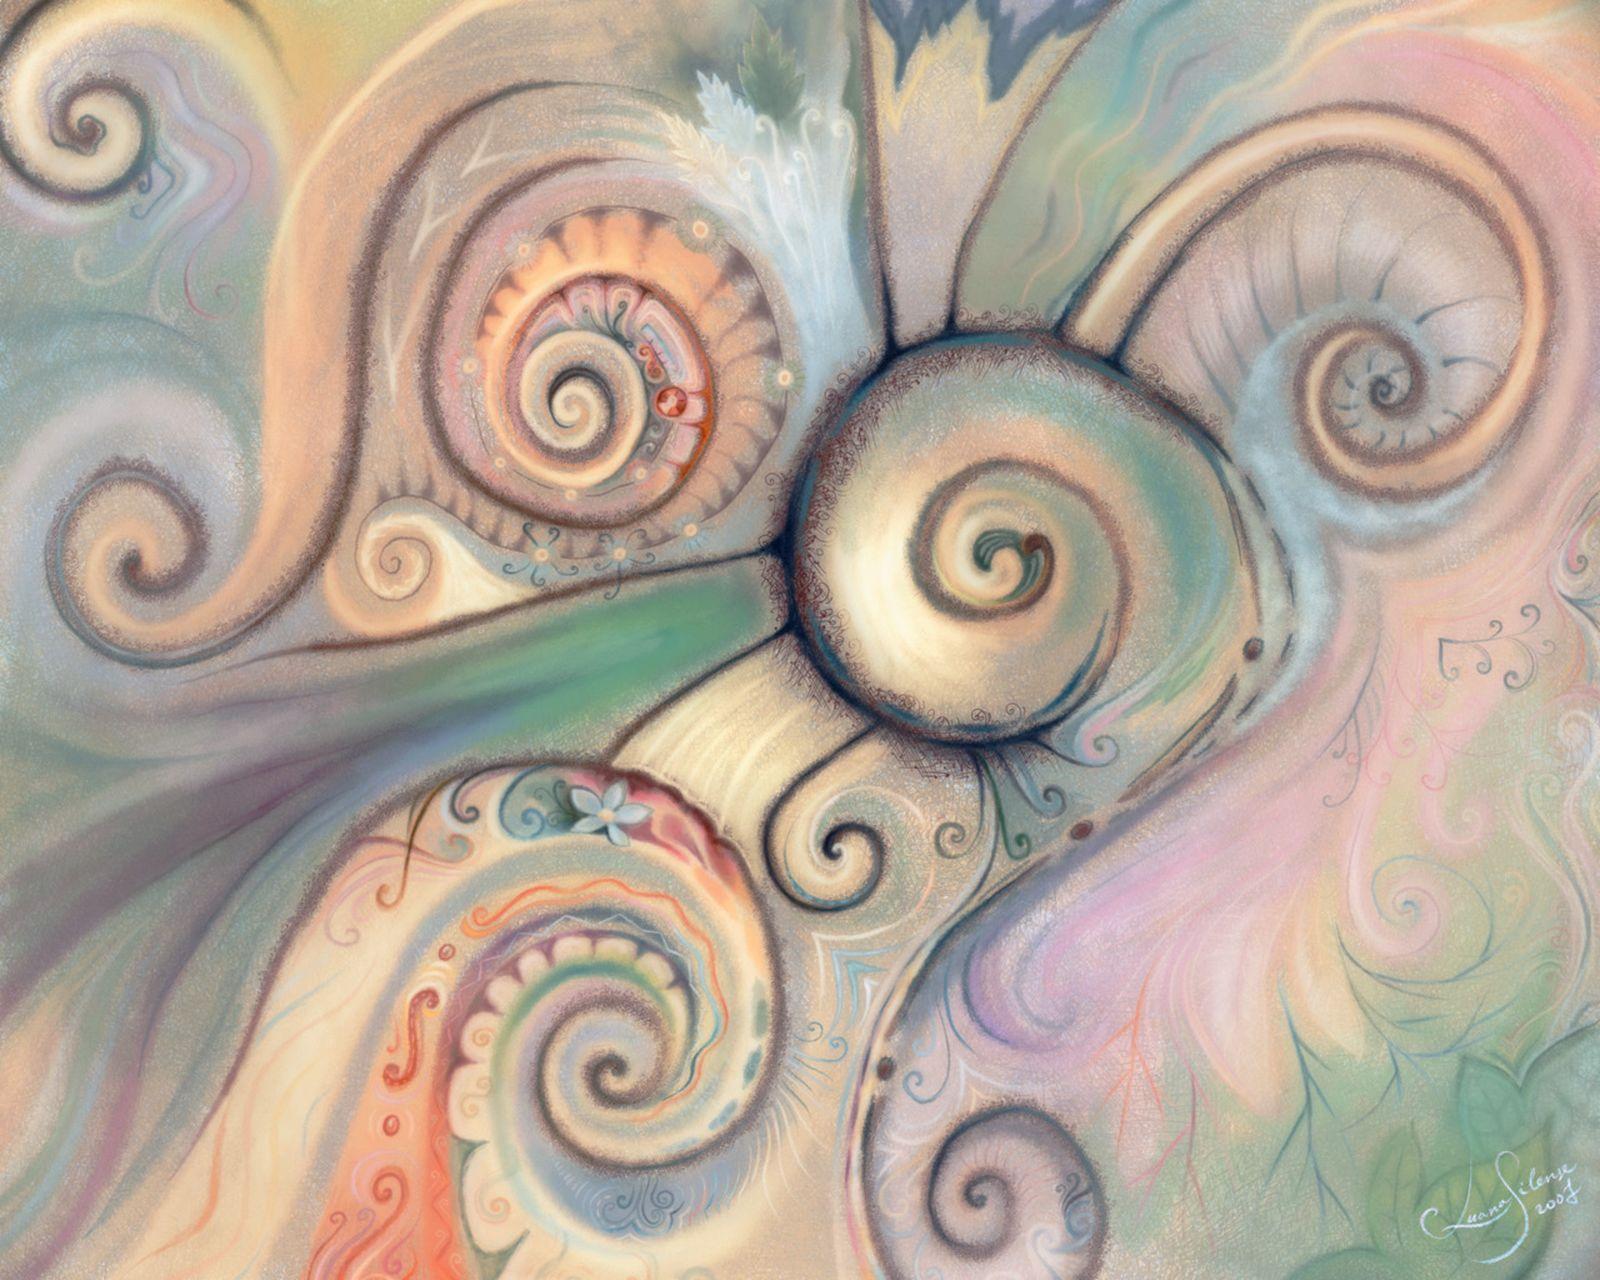 http://1.bp.blogspot.com/-2xkRZtyQD7g/Tkq1-dOPhSI/AAAAAAAAFUk/dF_eCwSIFBo/s1600/20070124_luana_wallpapers_ru_tanets_dushi_perlamutra_1280x1024_A%2528114728%2529.jpg